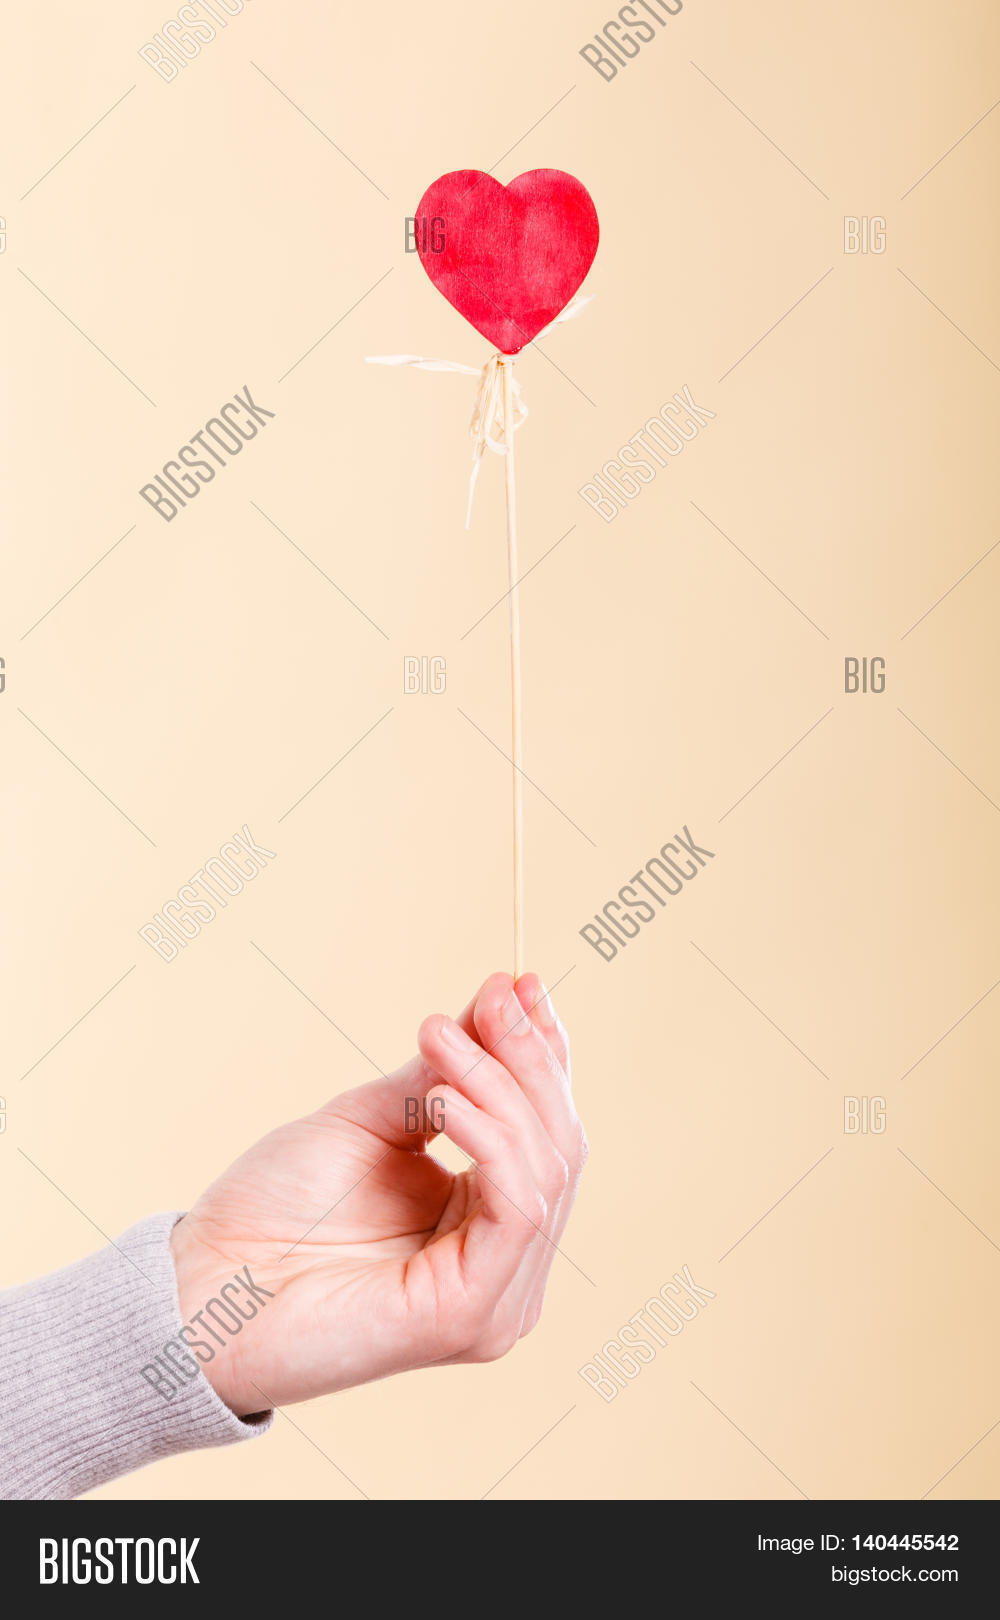 Symbolism Love Romance Image Photo Free Trial Bigstock